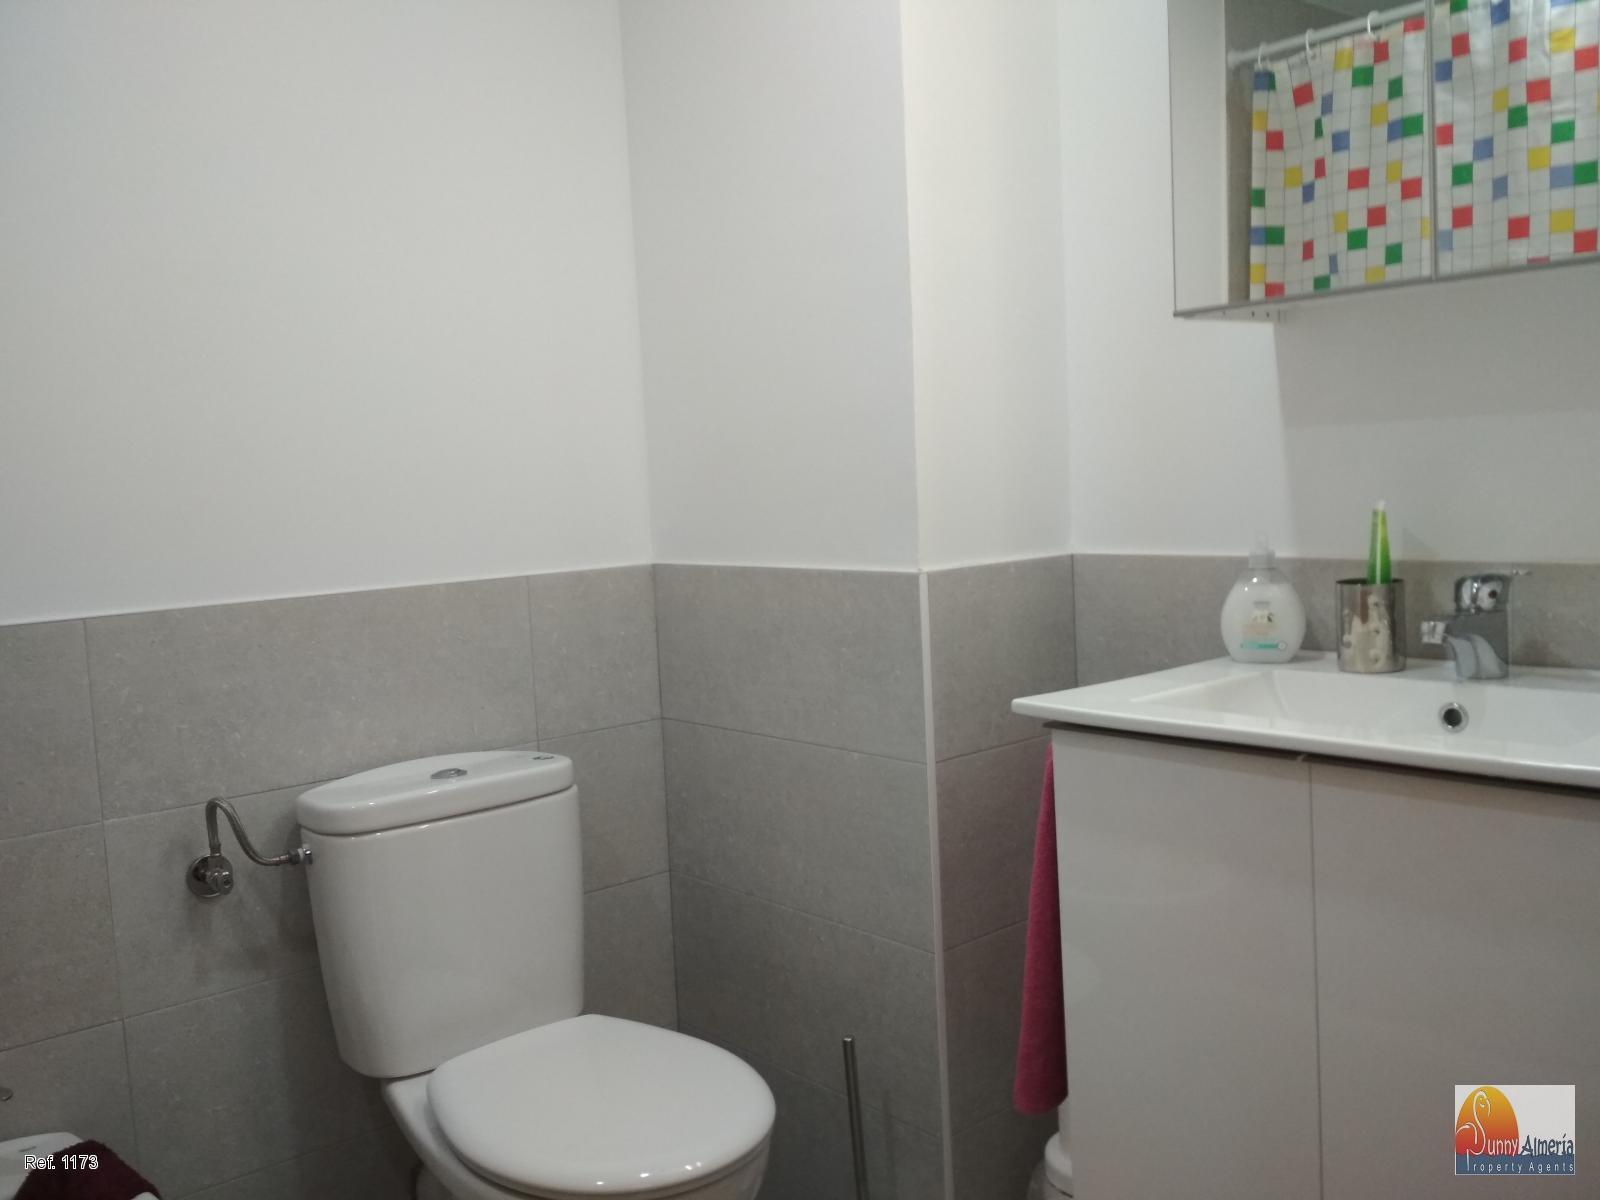 Apartment for rent in calle alameda 69 (Roquetas de Mar), 500 €/month (Season)